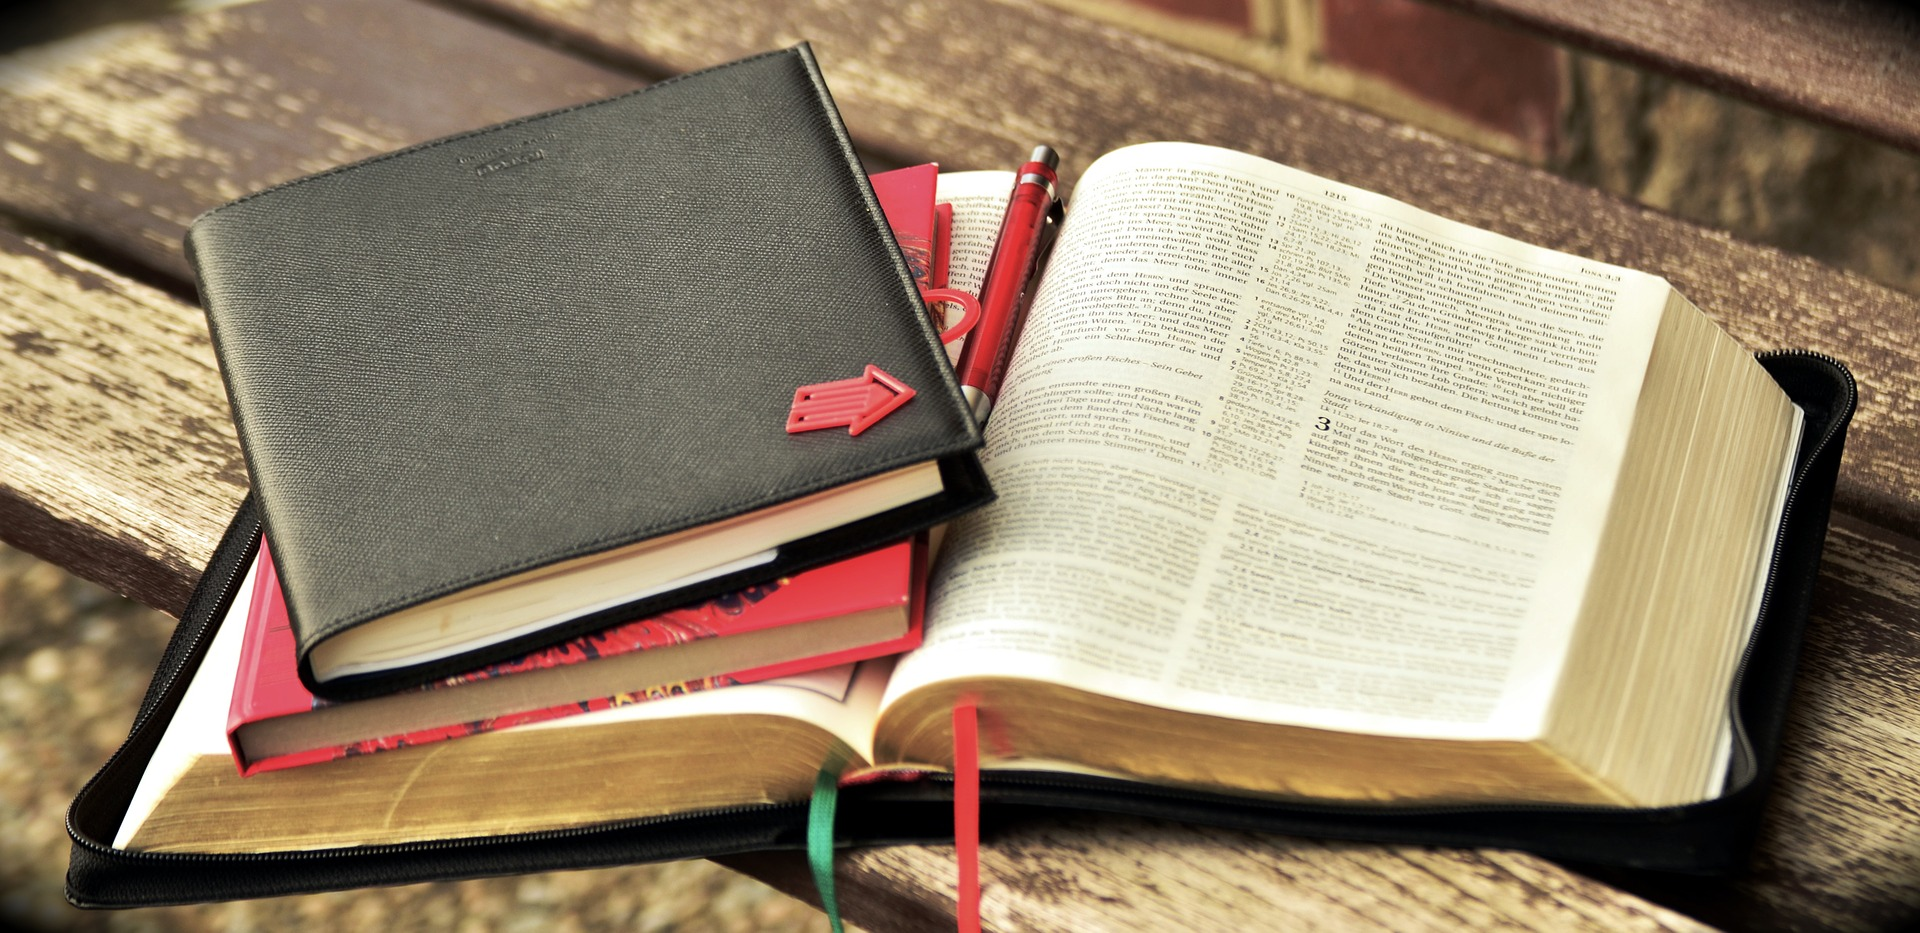 Bible Study Class in Woodruff on Mondays